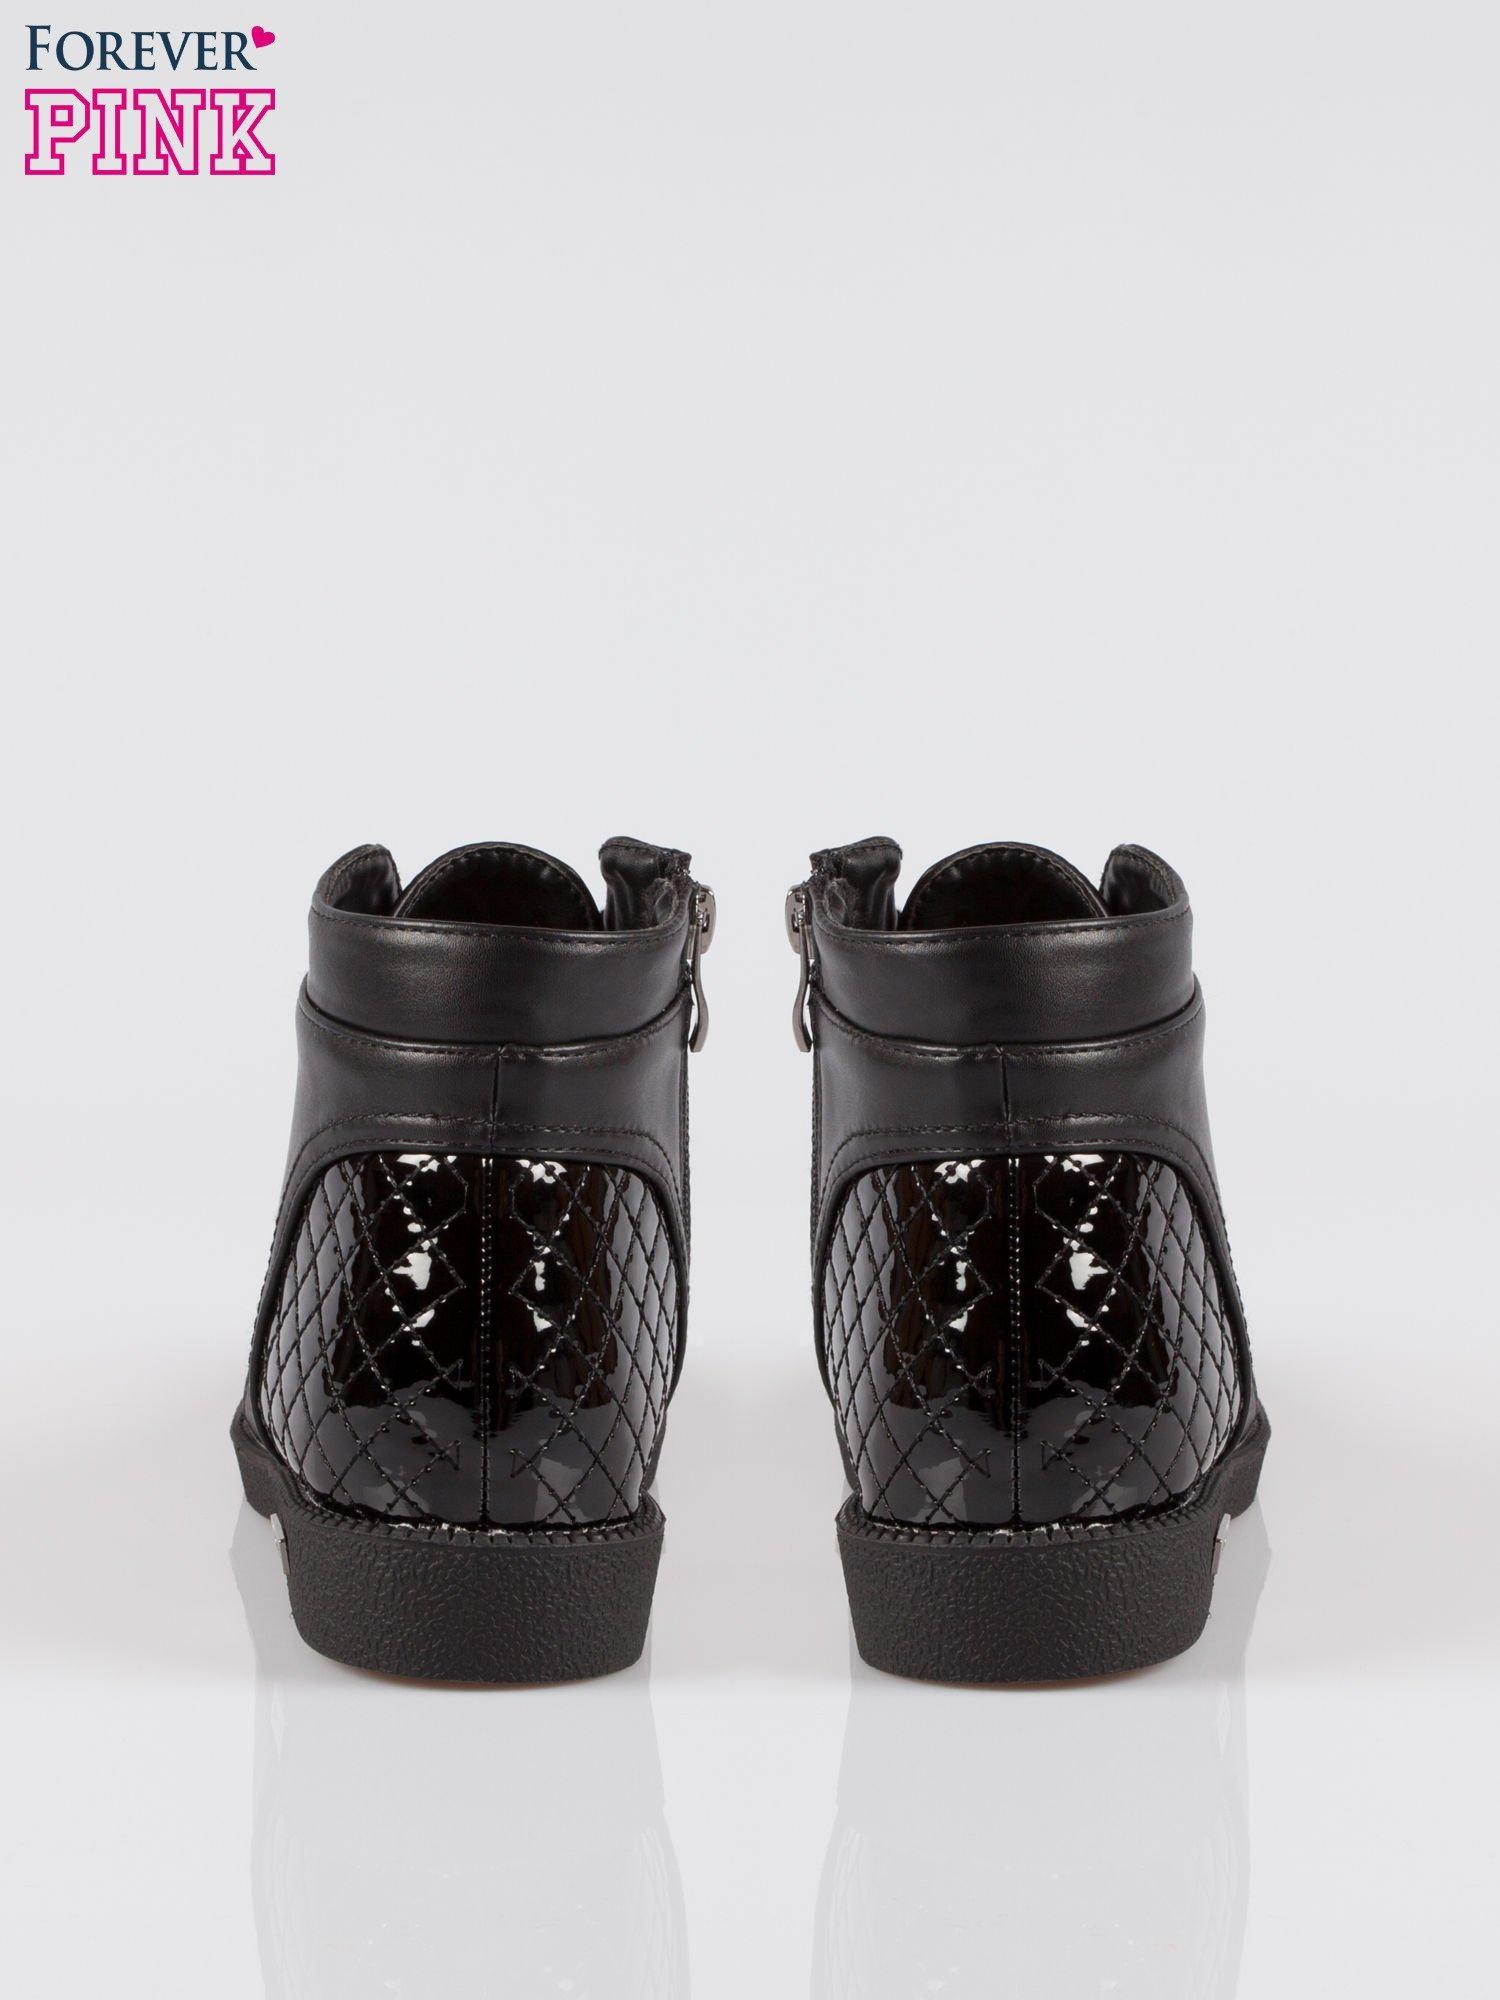 Czarne sznurowane botki damskie crocodile skin cap toe                                  zdj.                                  3